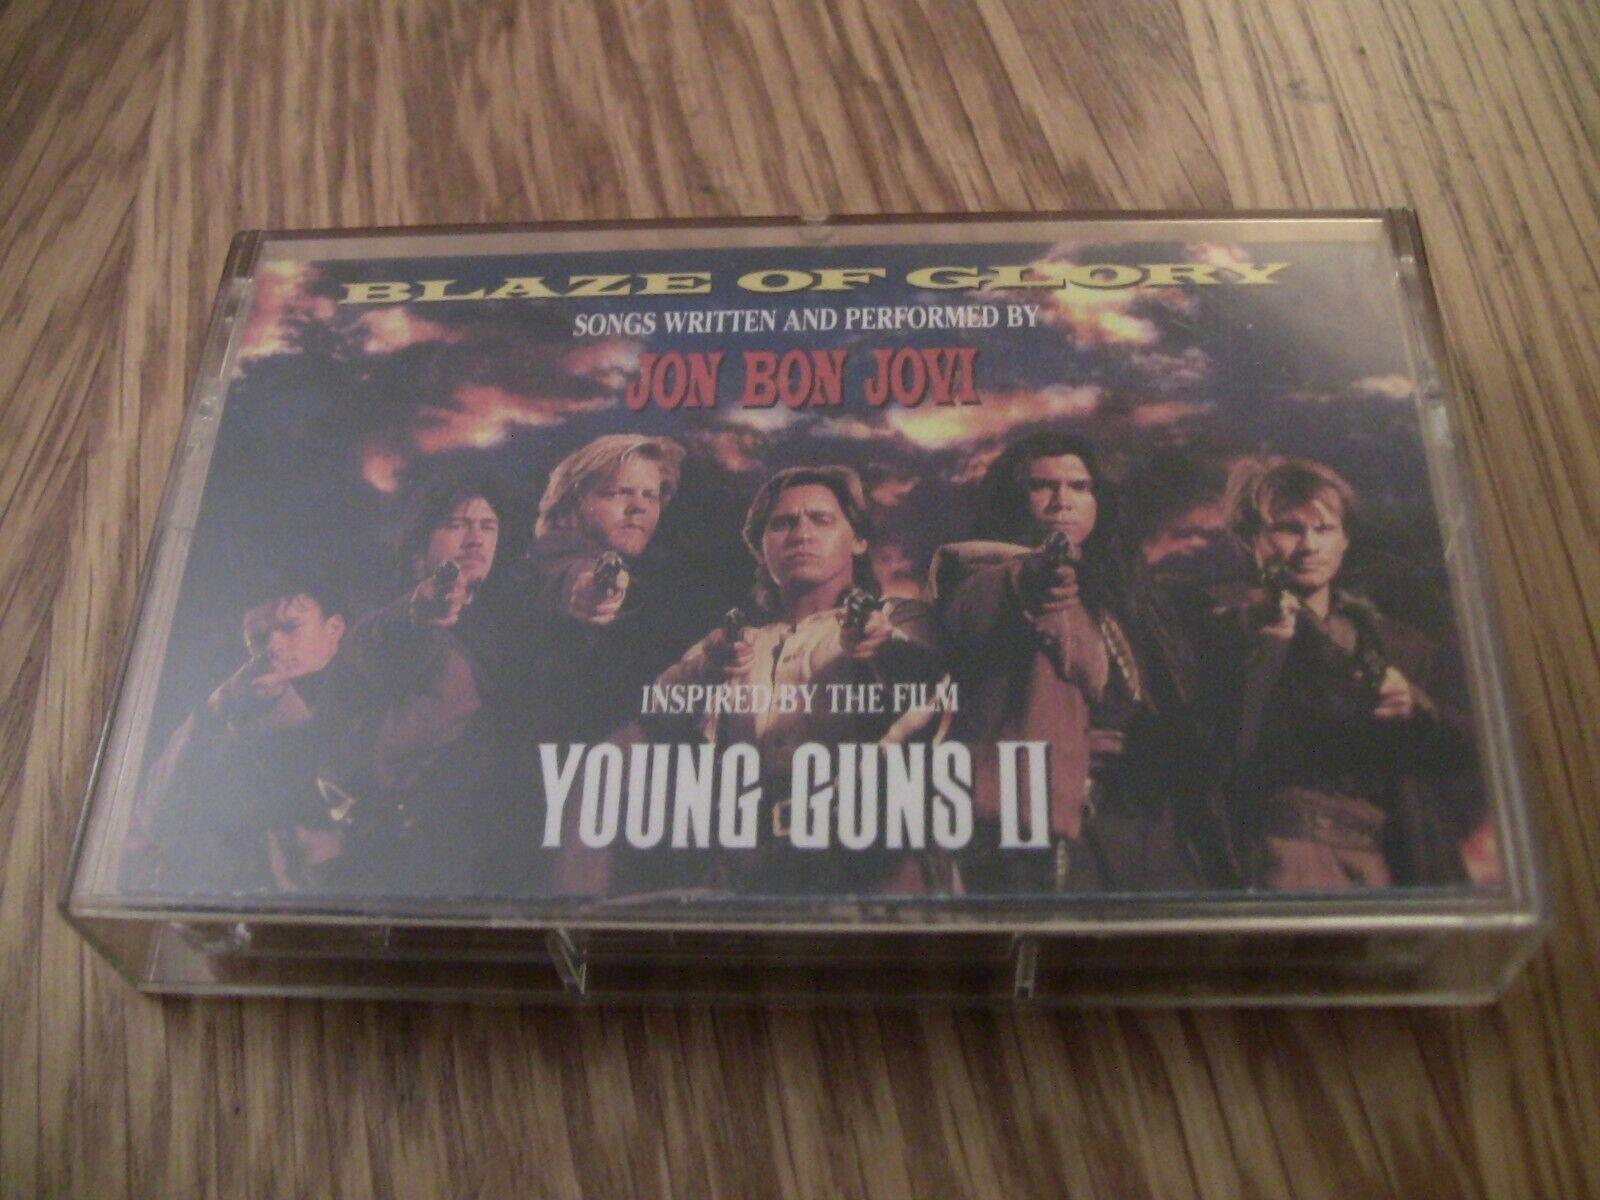 Jon Bon Jovi Blaze of Glory Young Guns 2 Cassette Tape